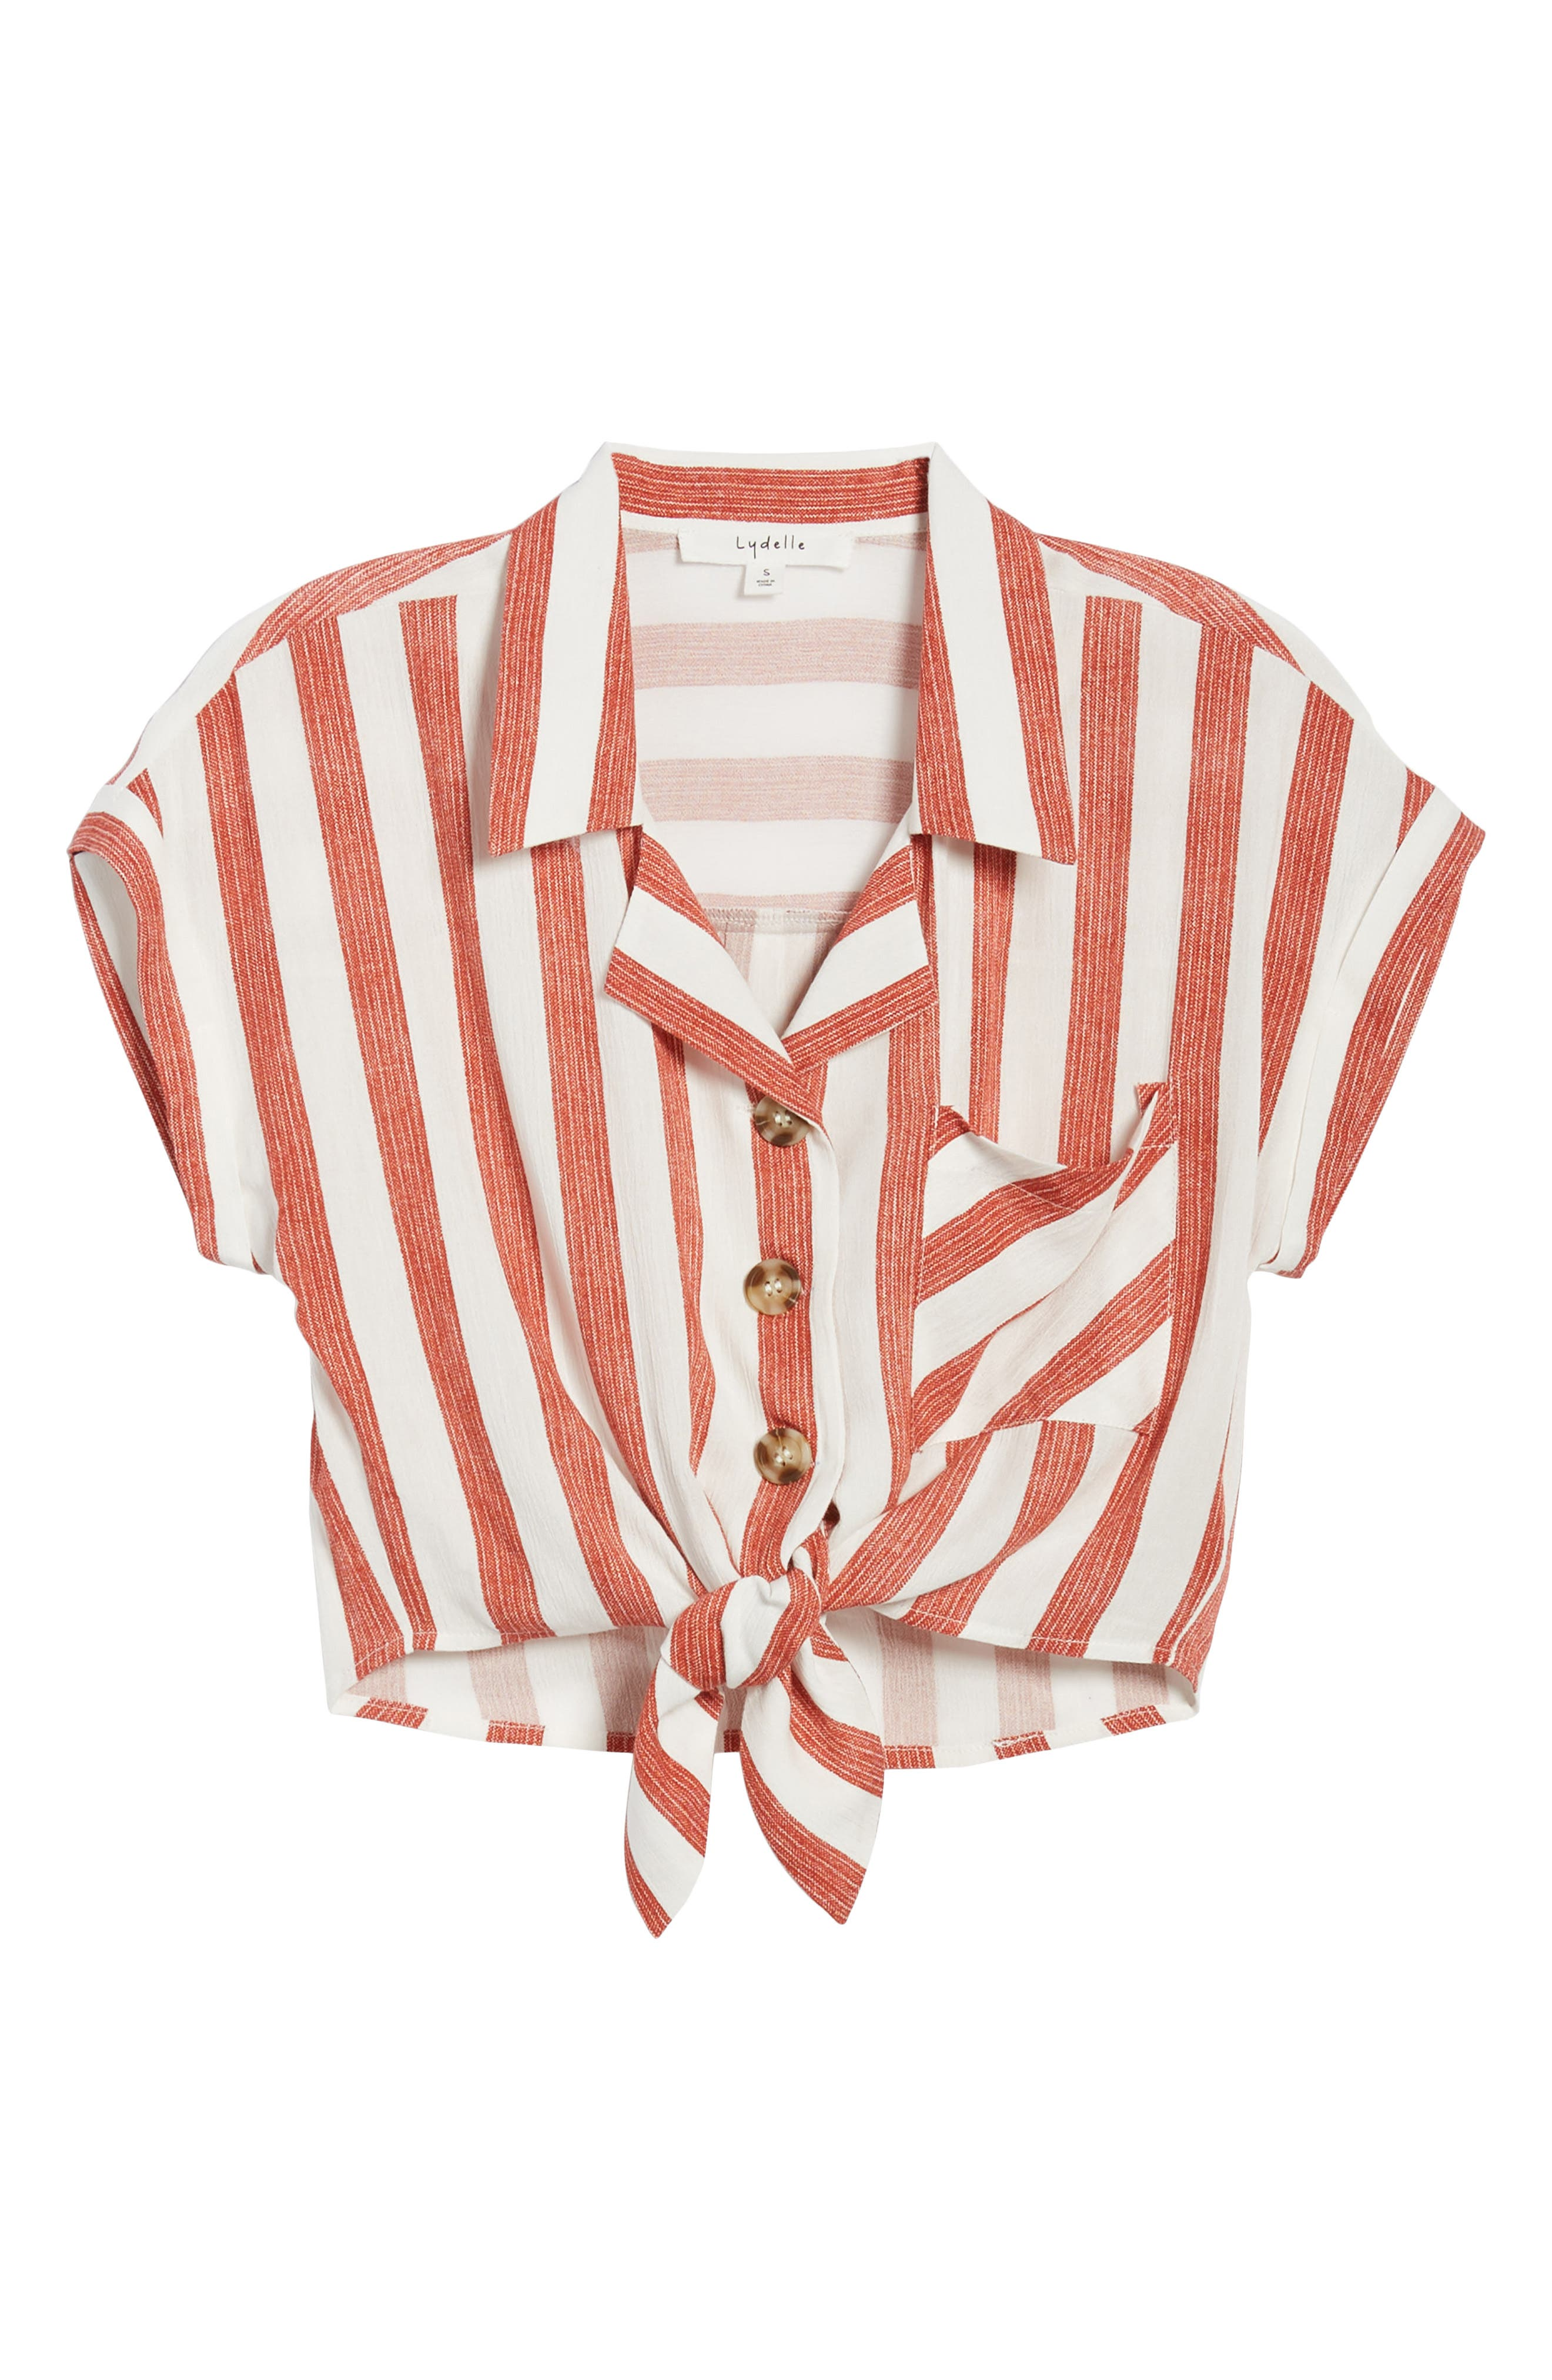 LYDELLE,                             Stripe Tie Front Top,                             Alternate thumbnail 7, color,                             600